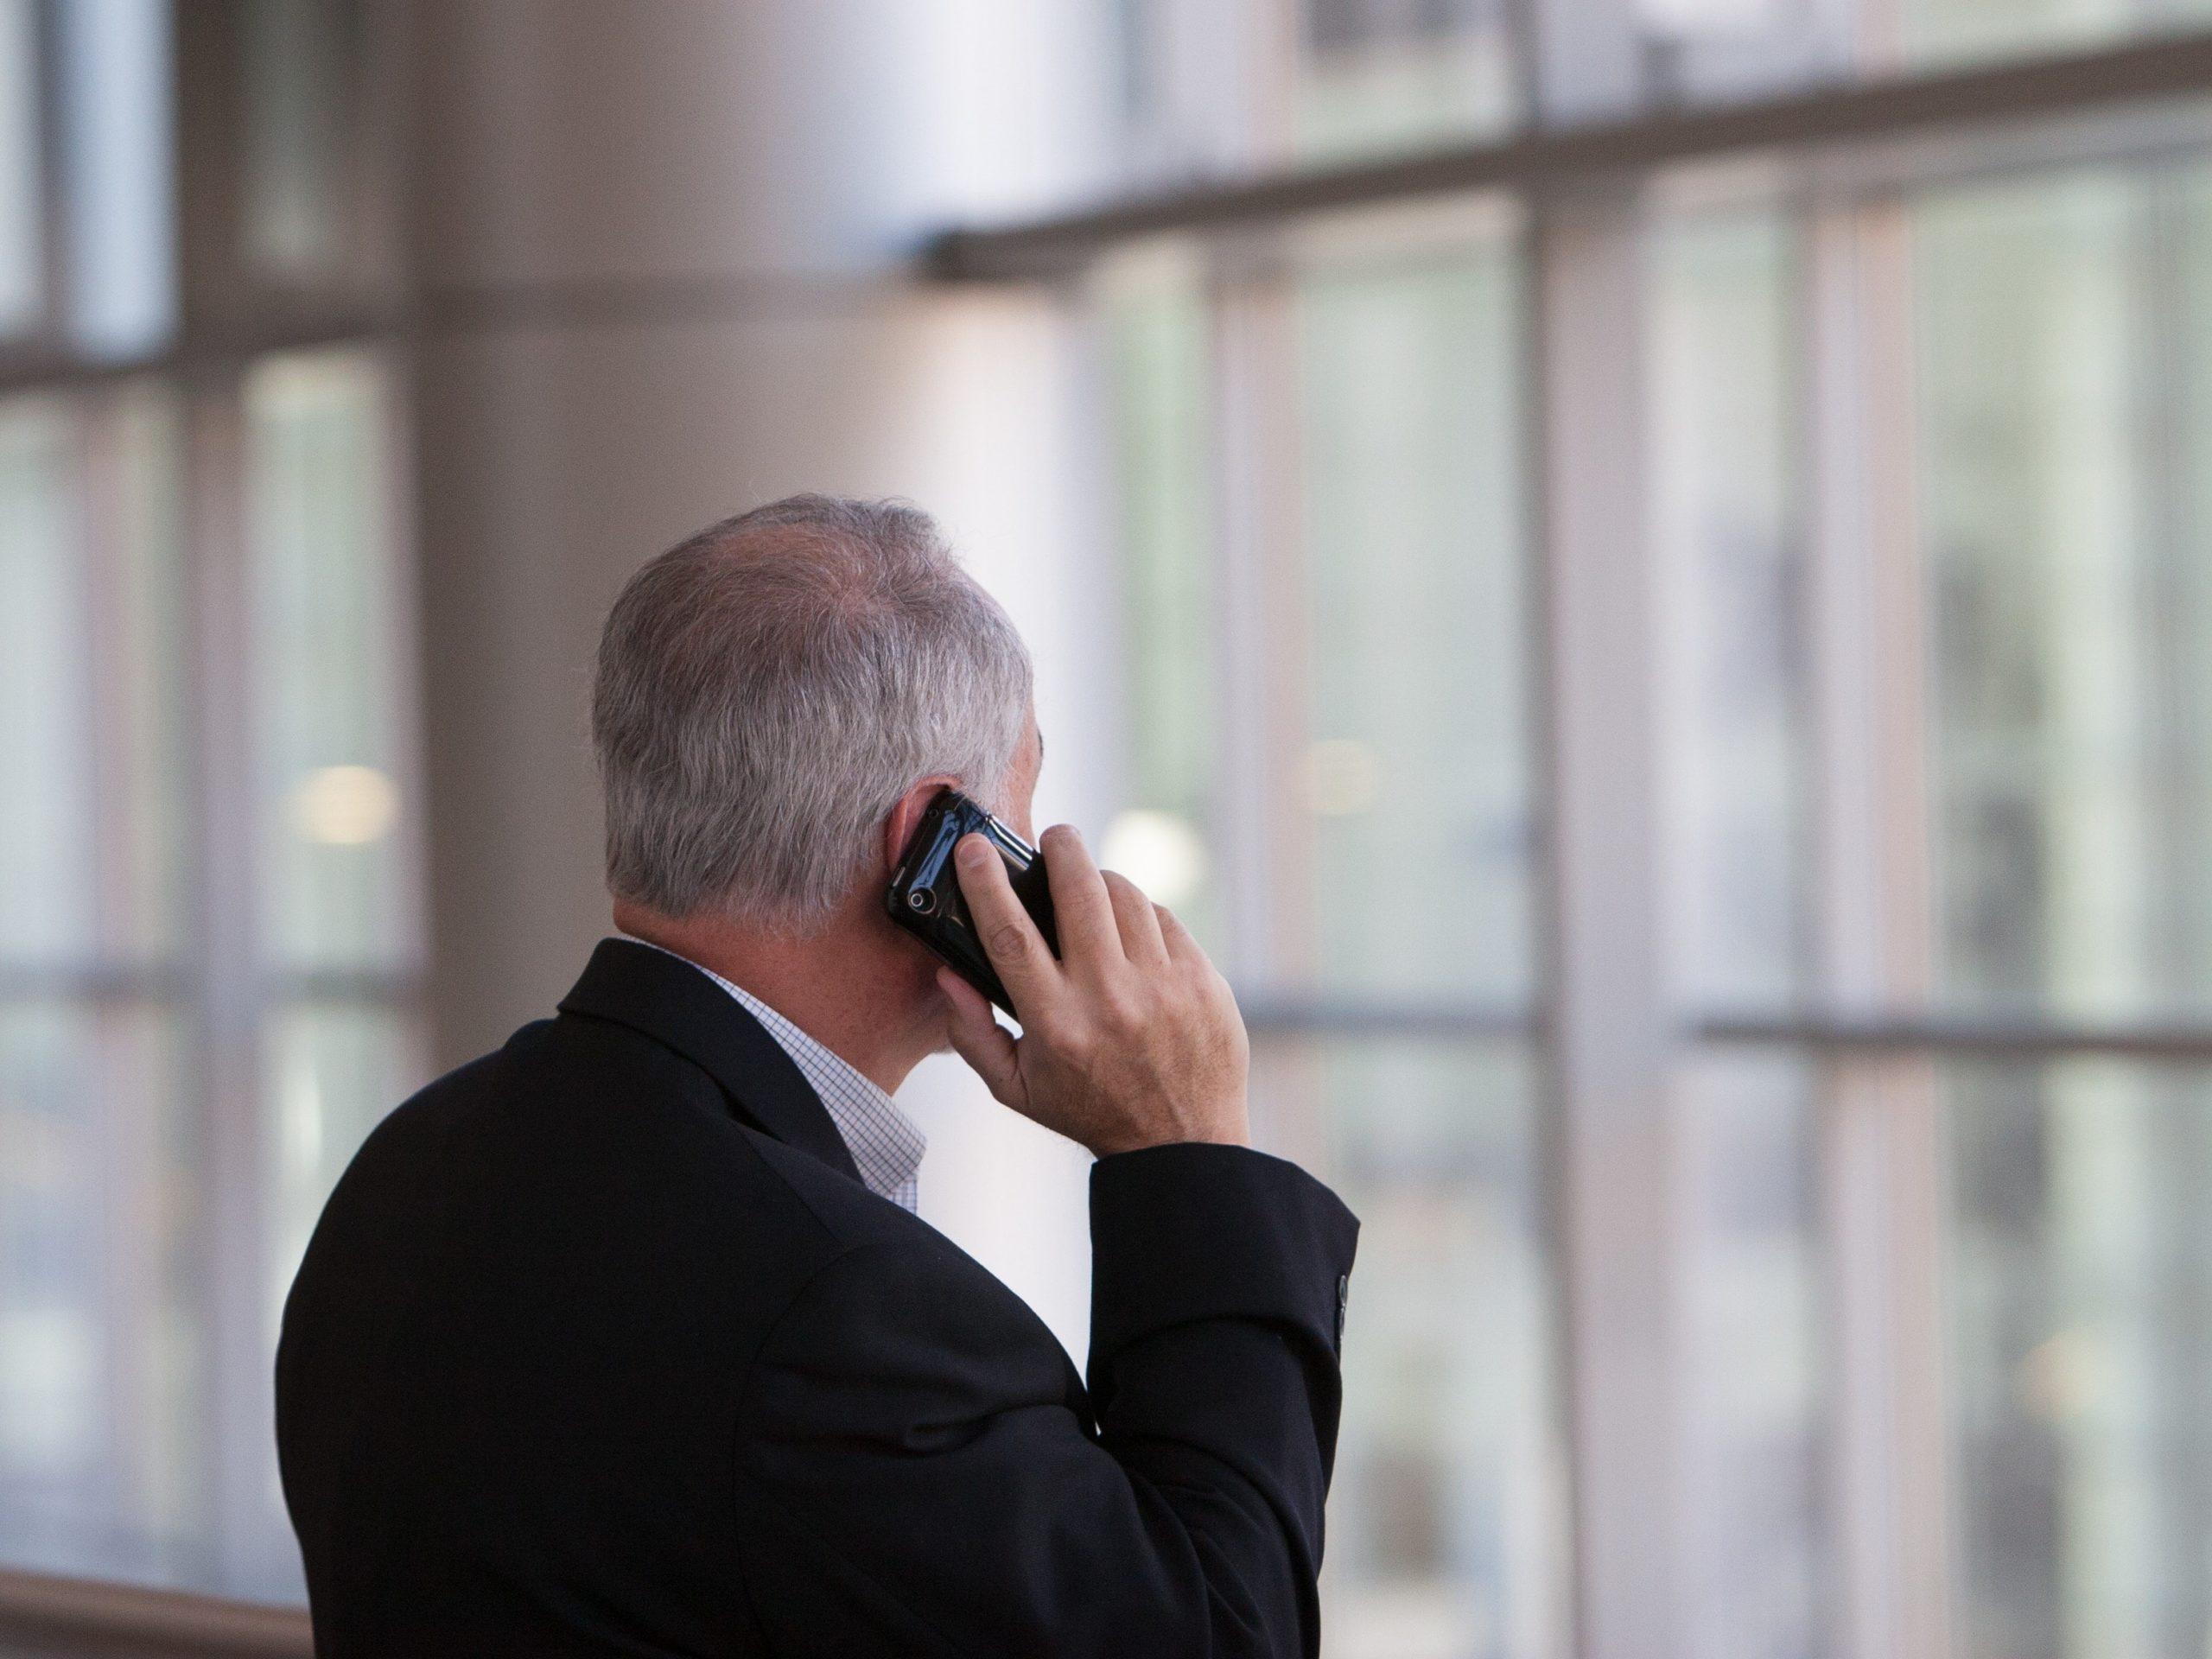 Man making a phone call.